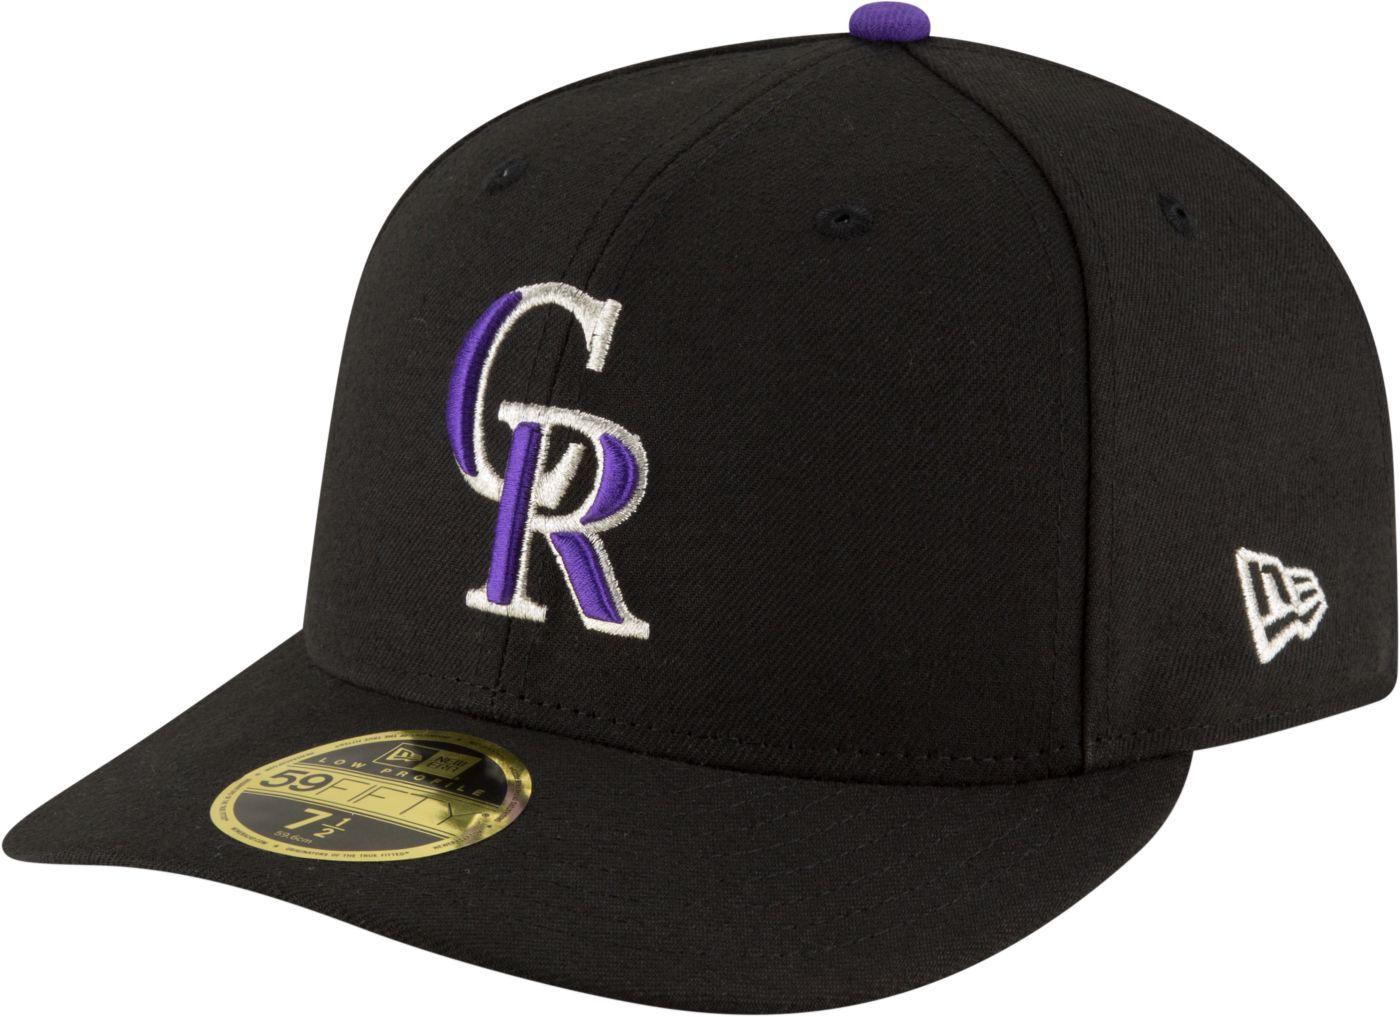 New Era Men's Colorado Rockies 59Fifty Game Black Low Crown Authentic Hat